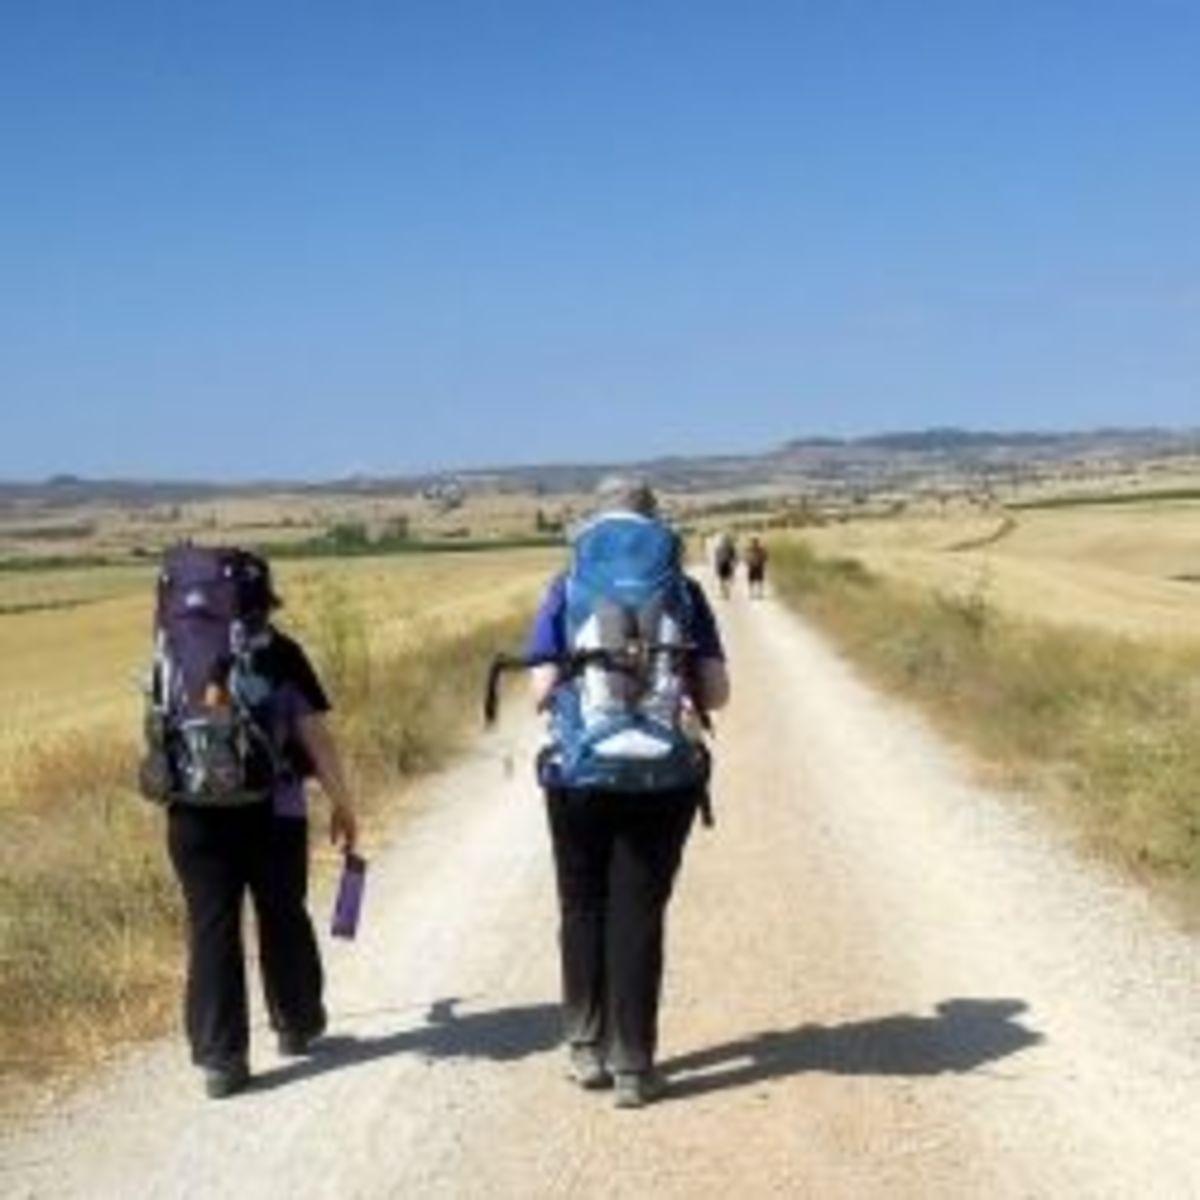 Pilgrims walking the Camino de Santiago